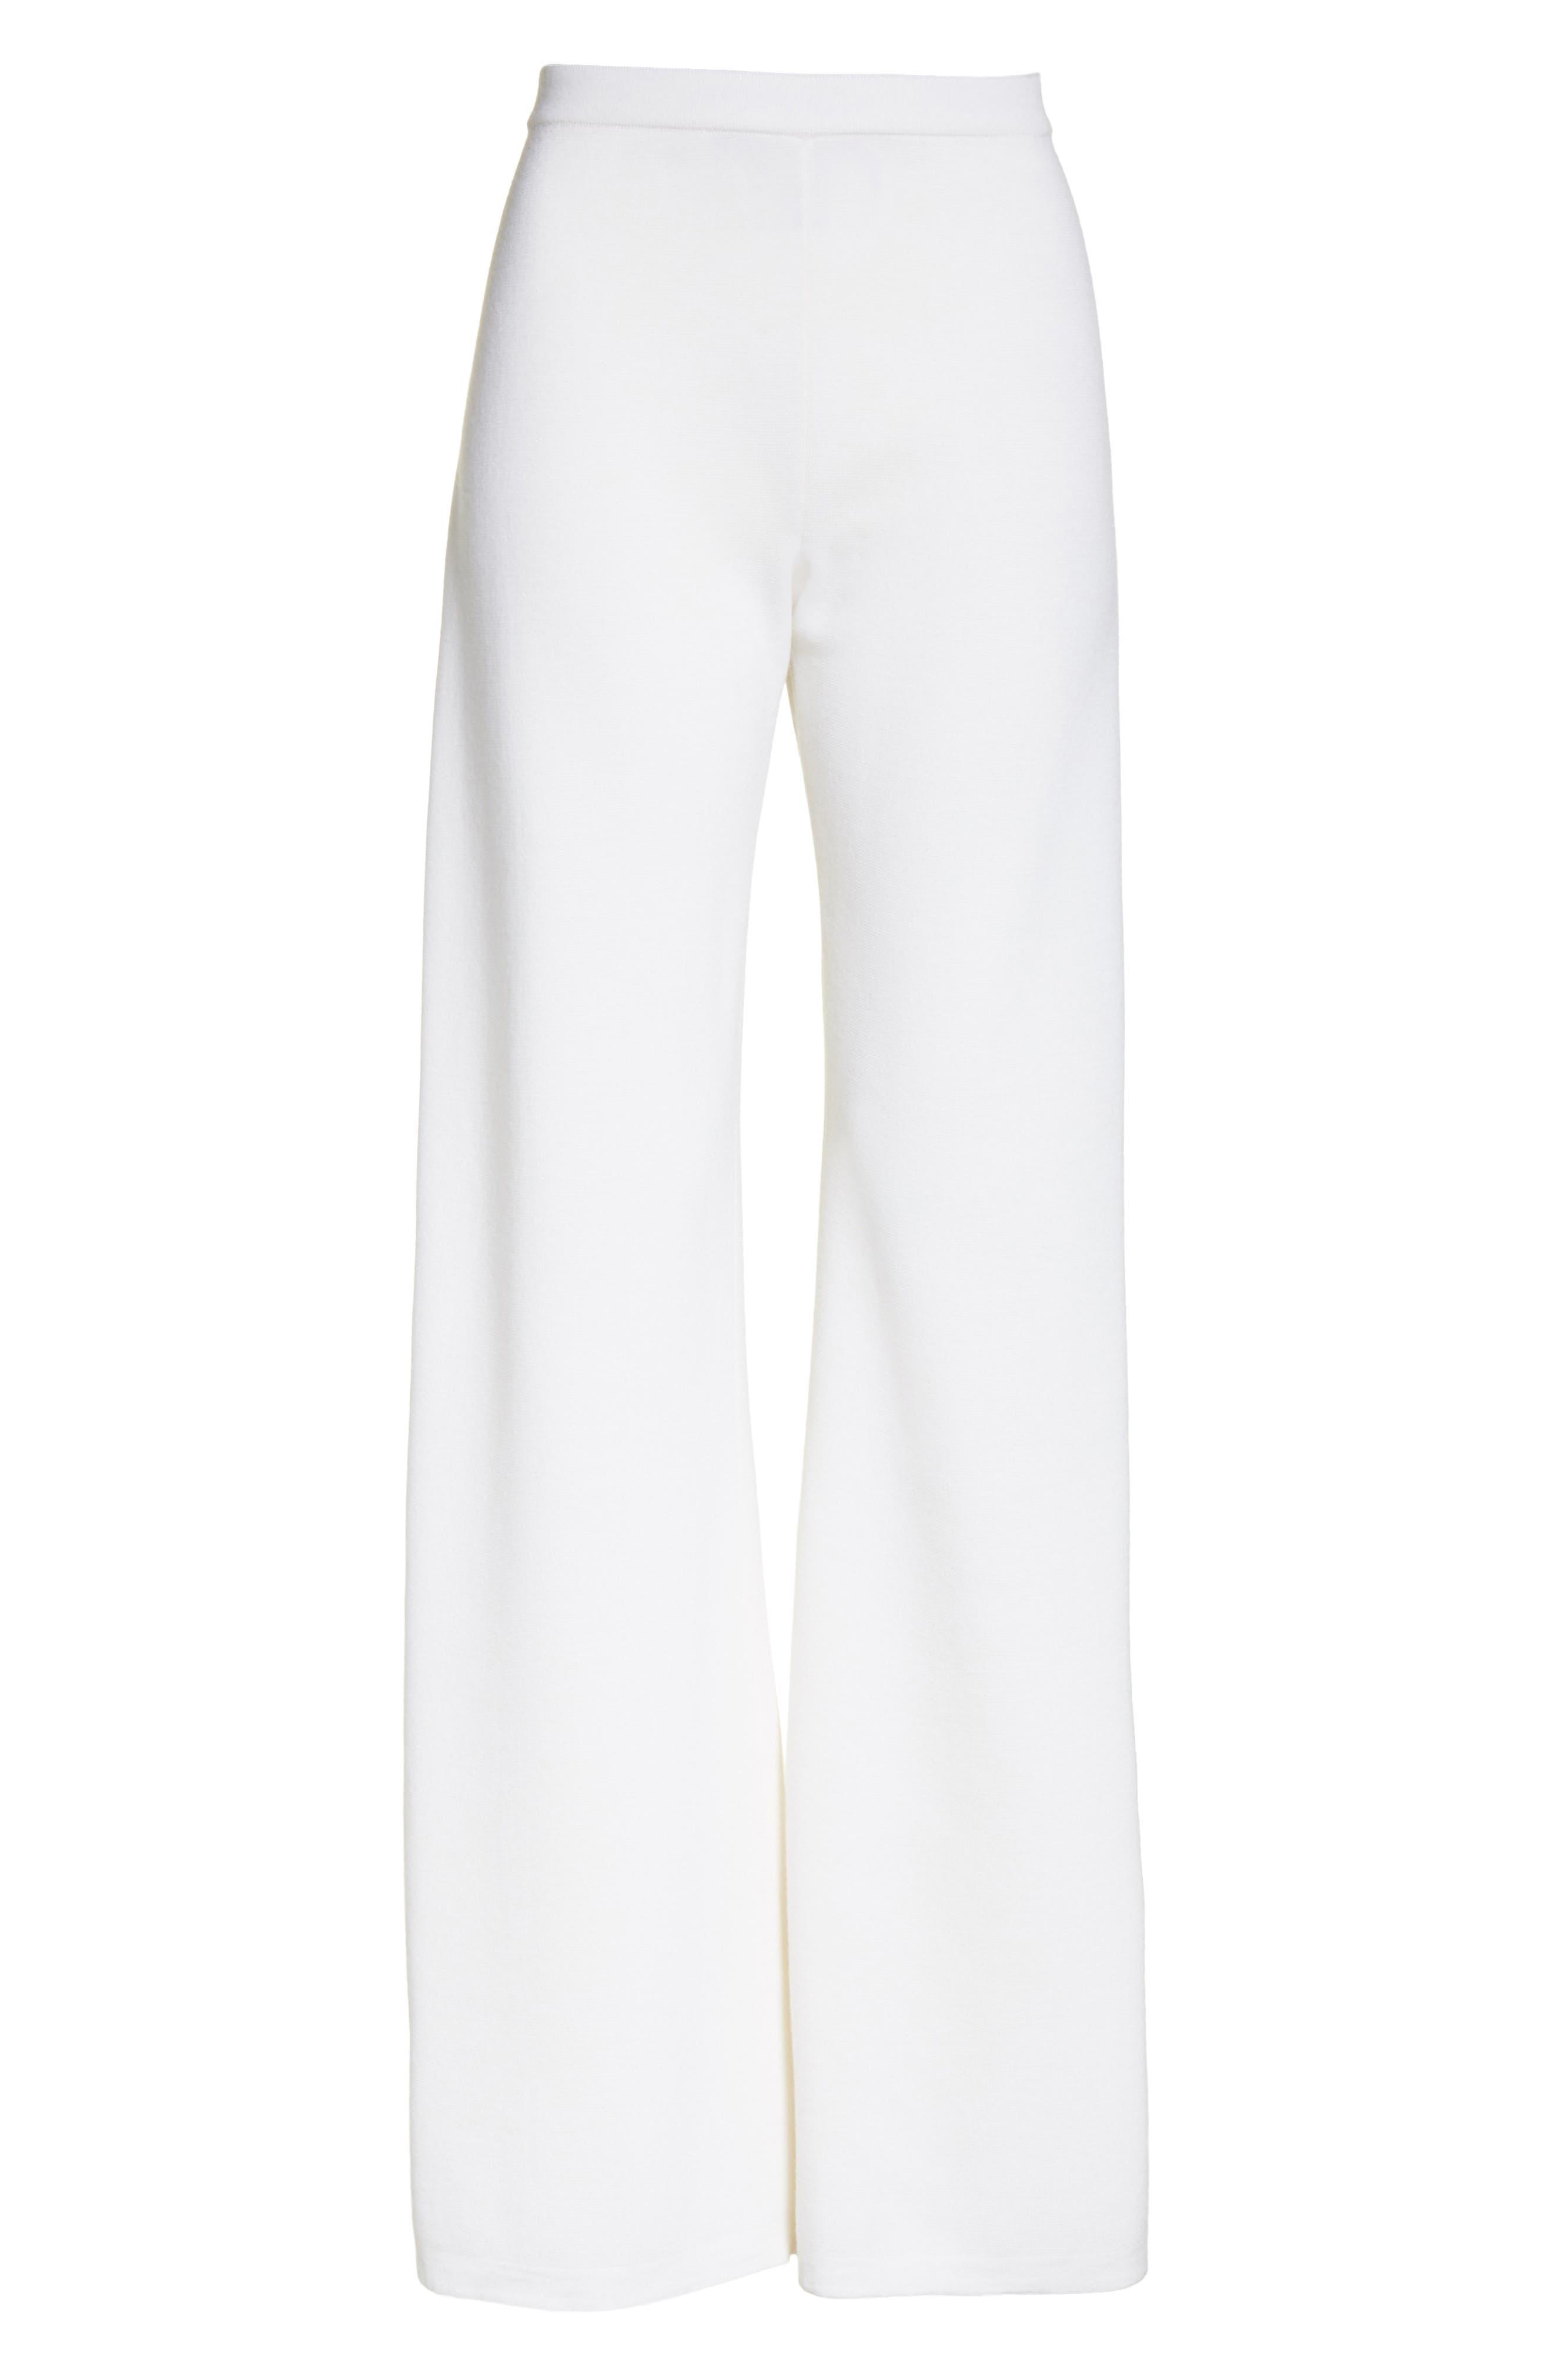 Brando Wool Wide Leg Pants,                             Alternate thumbnail 6, color,                             110